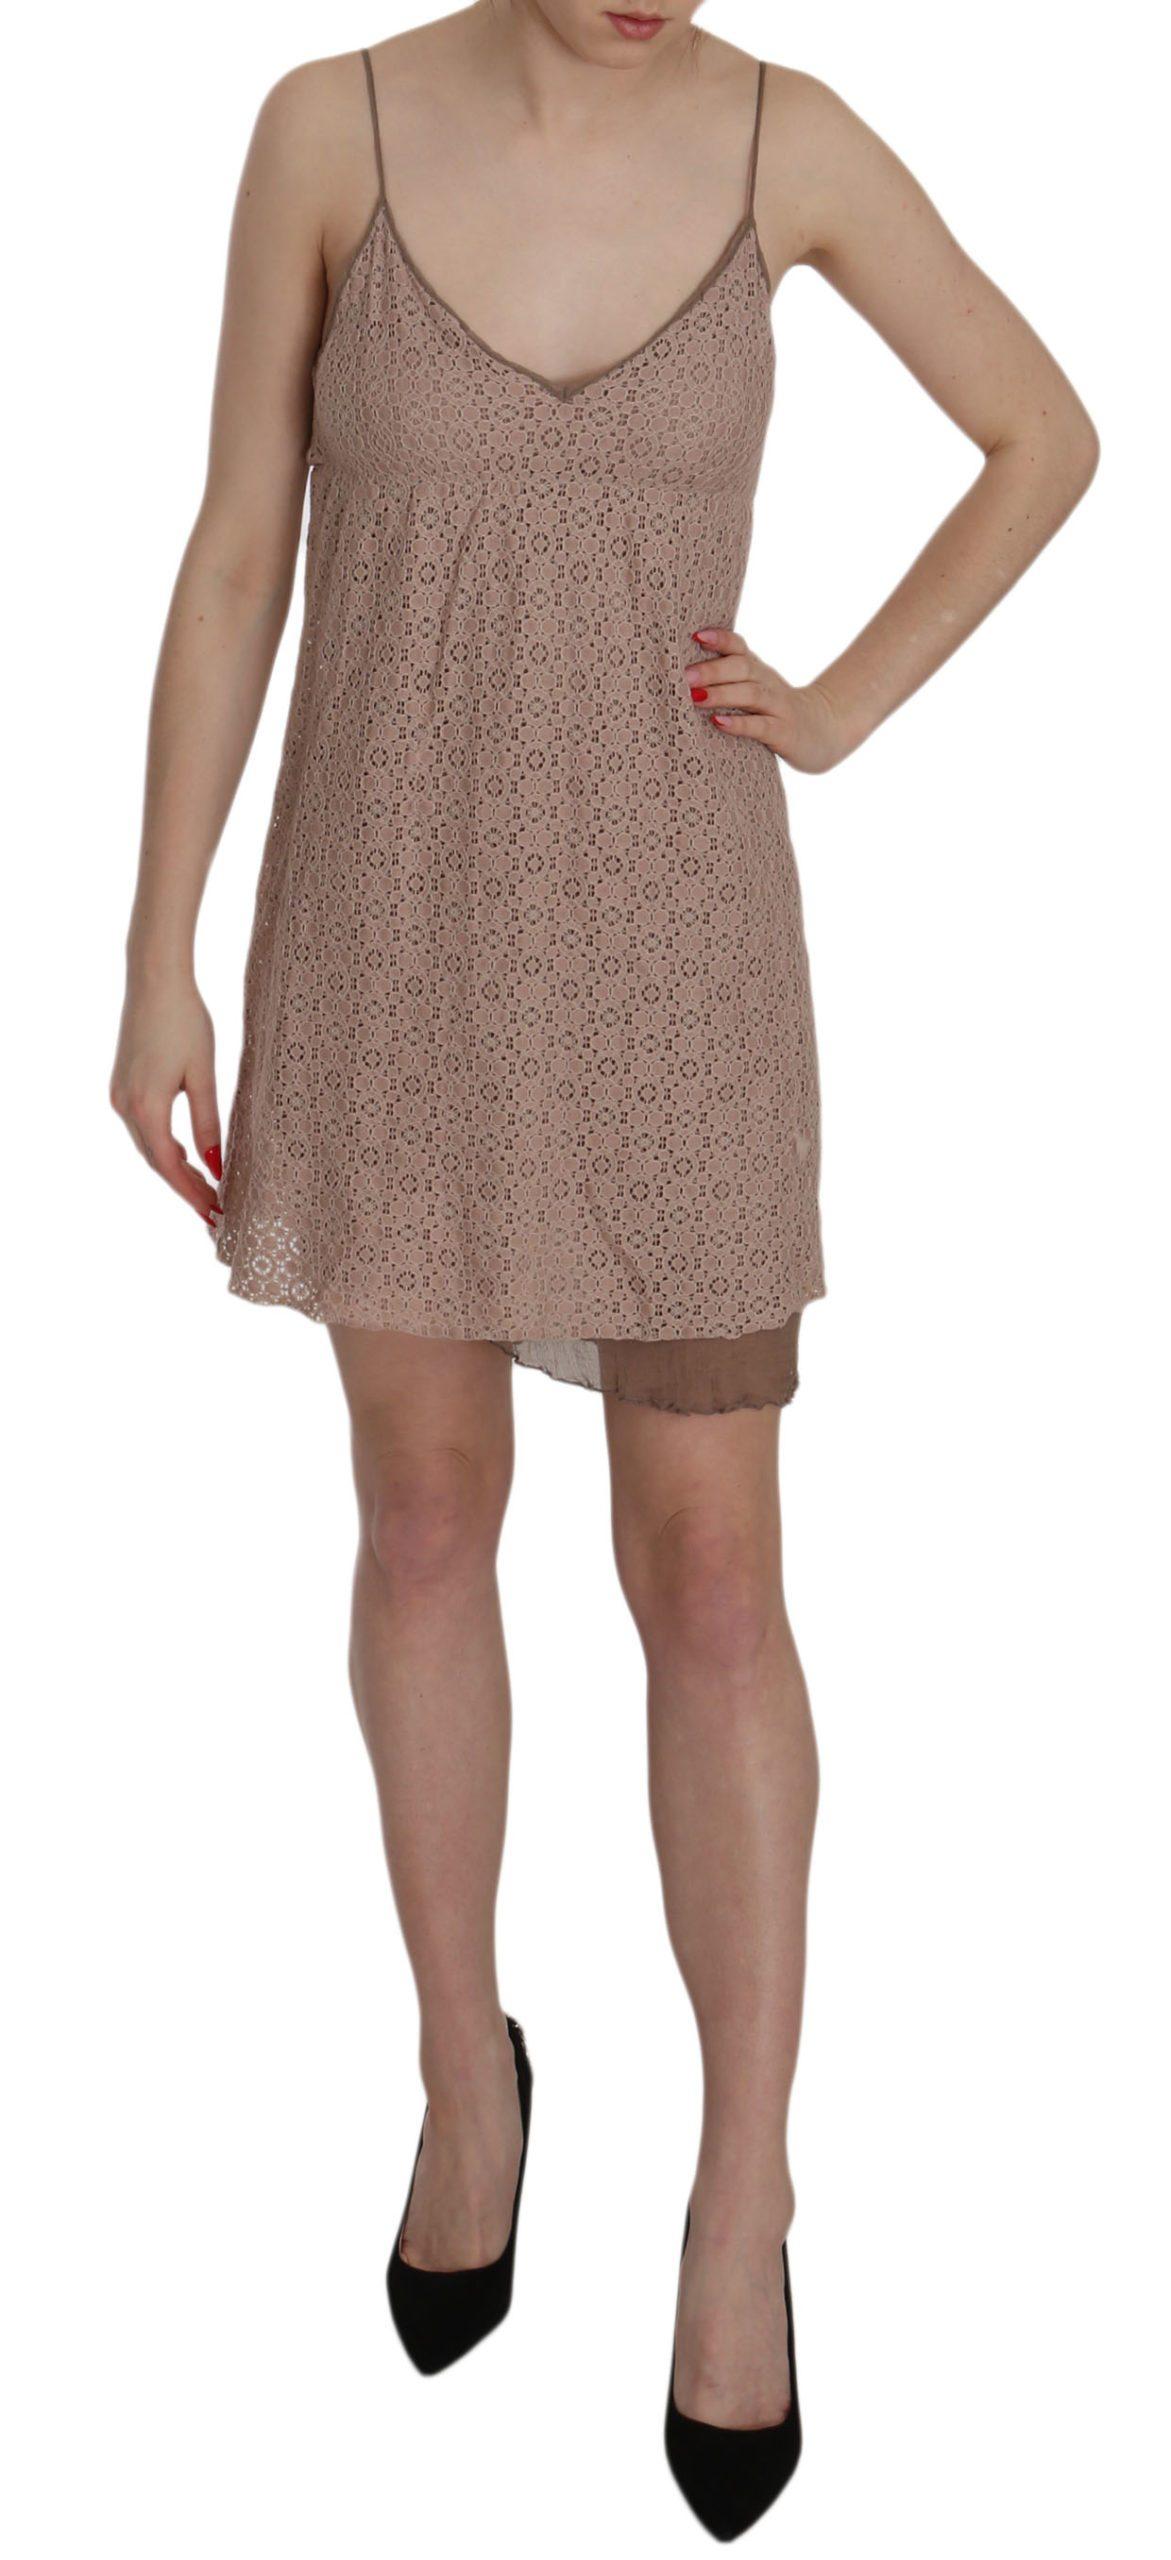 PINK MEMORIES Women's Spaghetti Strap A-line Cotton Dress Beige TSH3475 - IT40 S